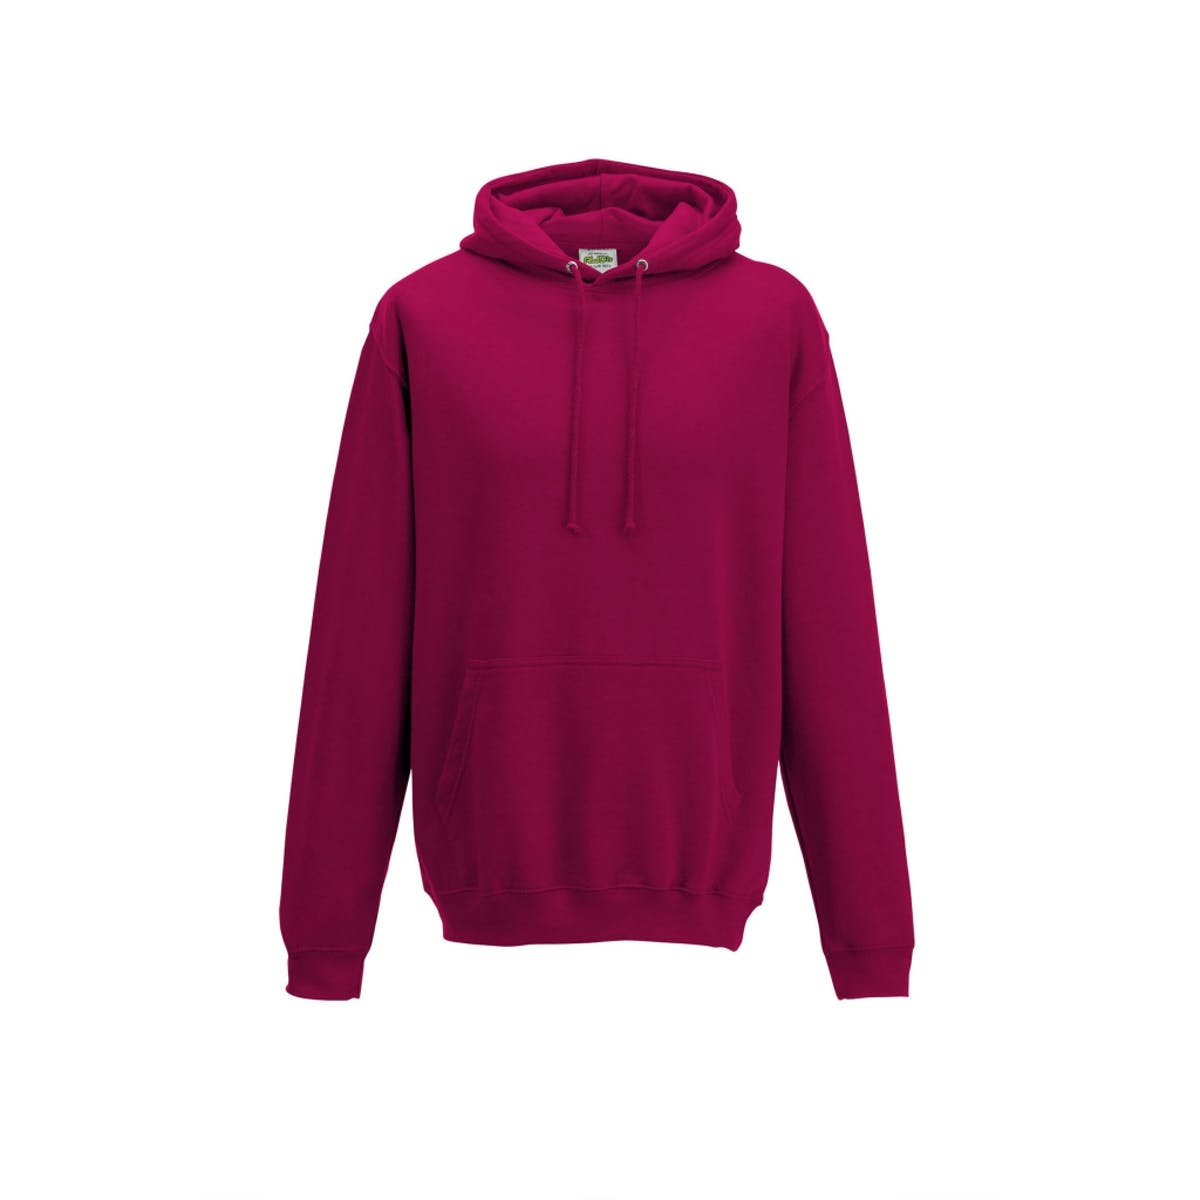 cranberry college hoodies